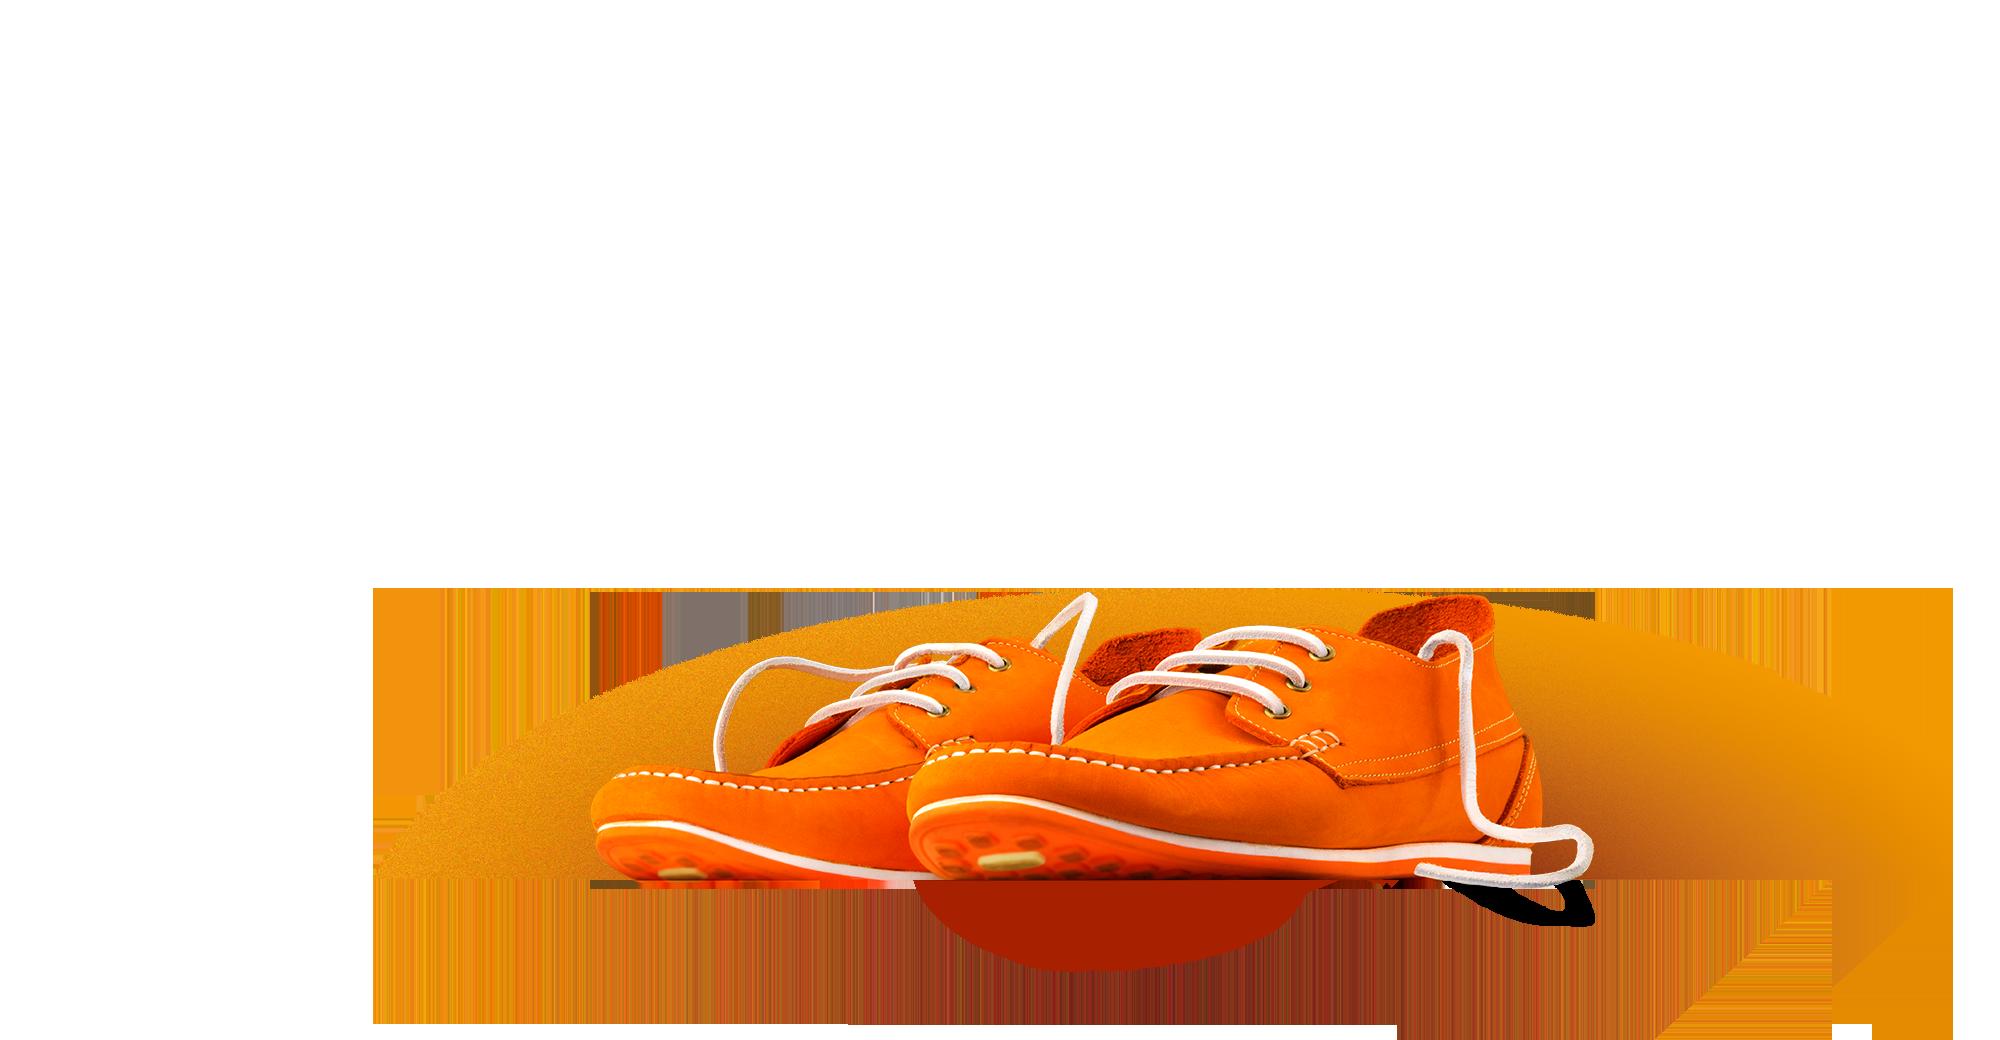 Orange shoes to represent brand identity.